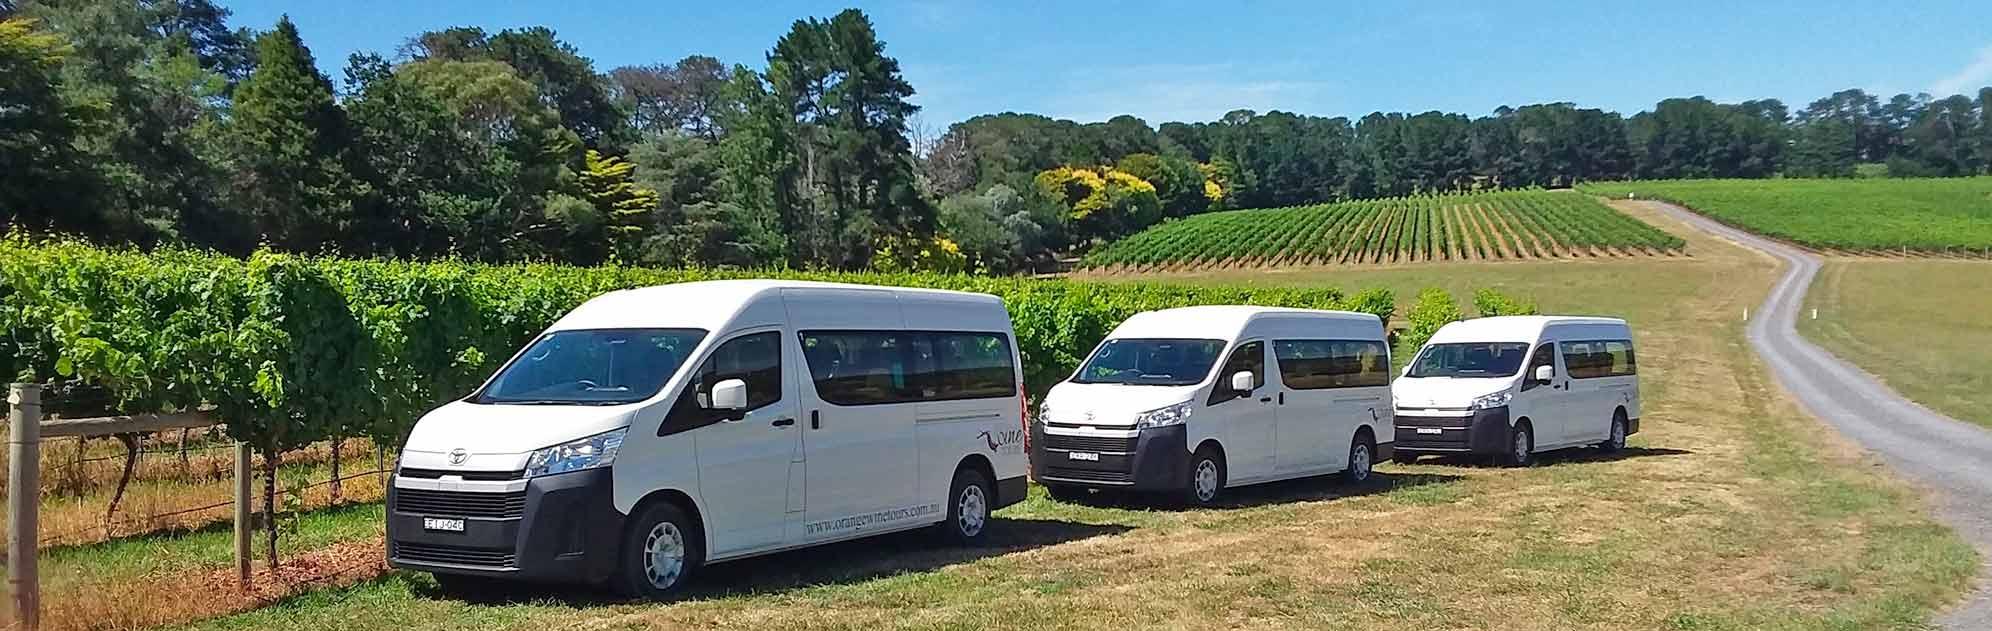 Three tour vans